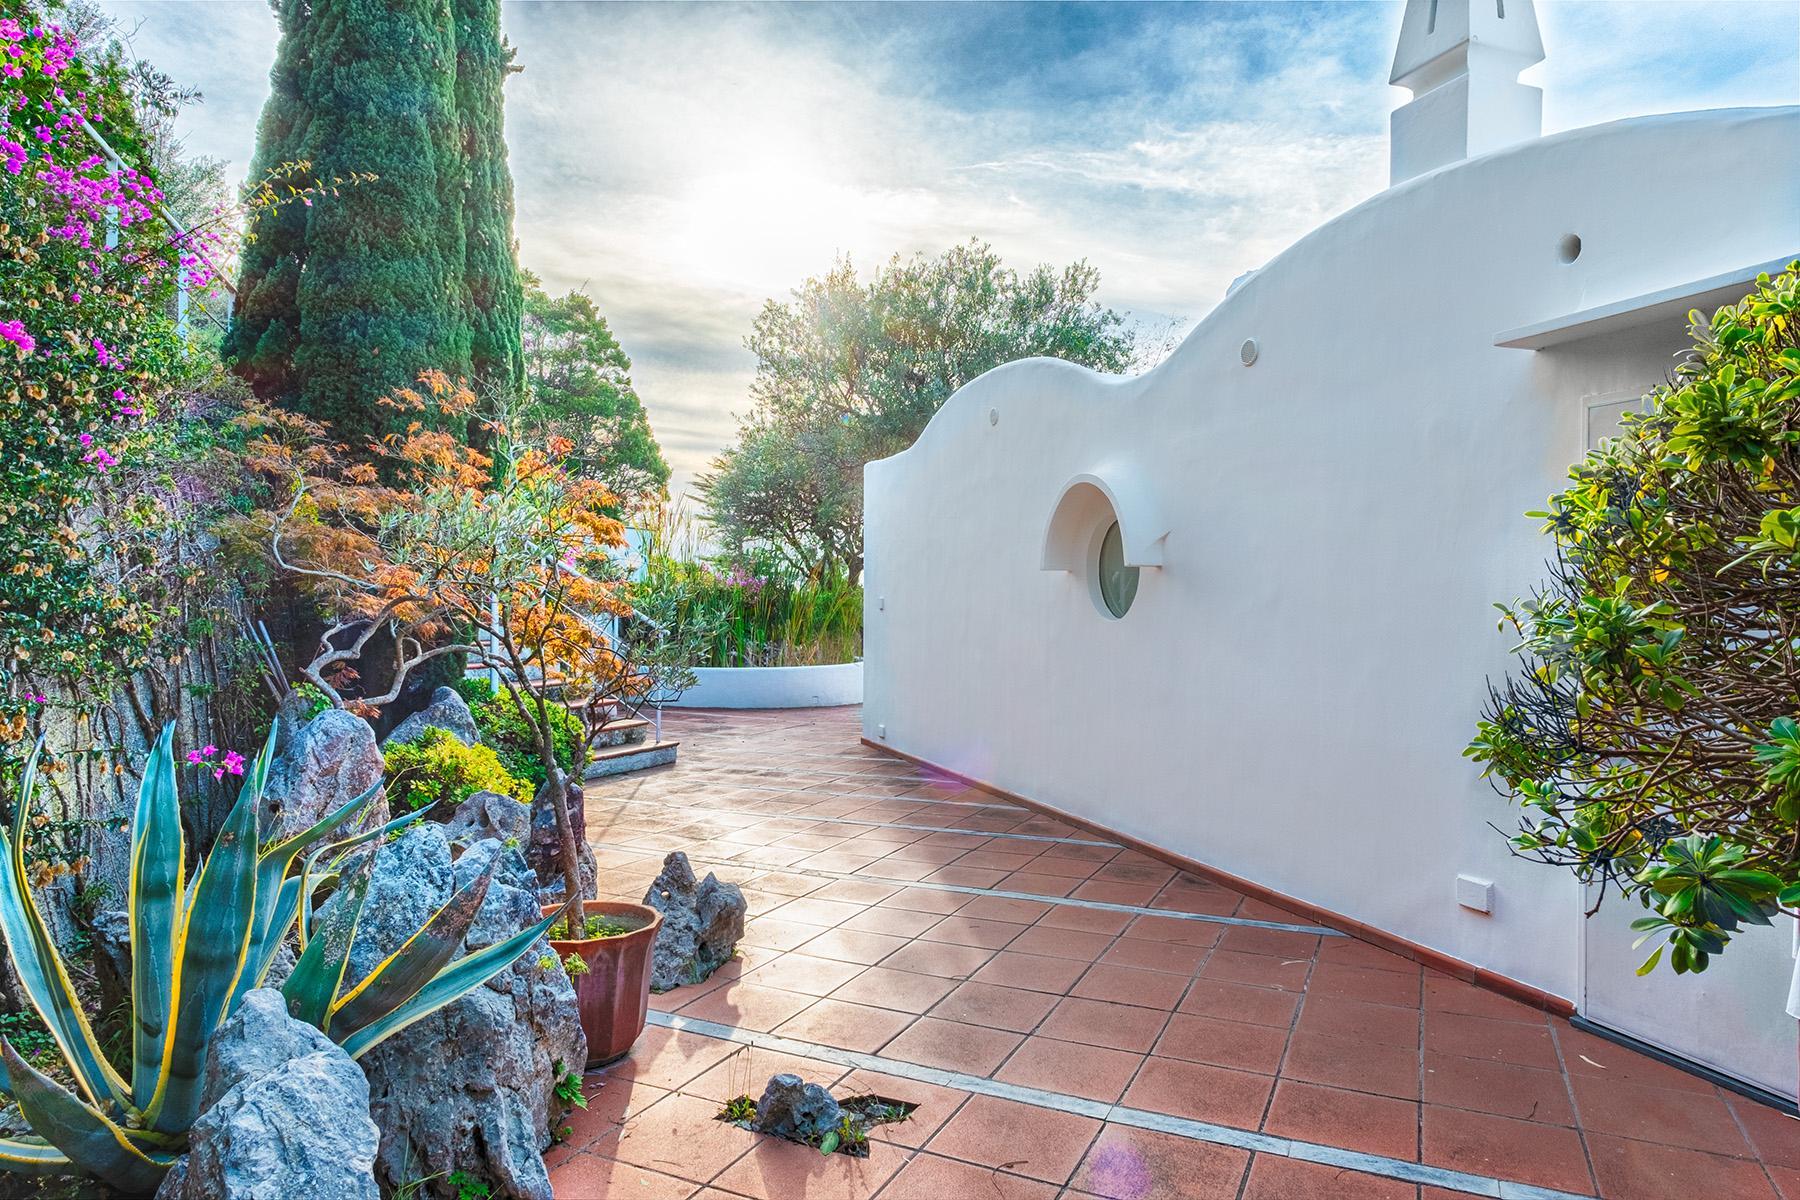 Panoramic villa with swimming pool in Anacapri city center - 9